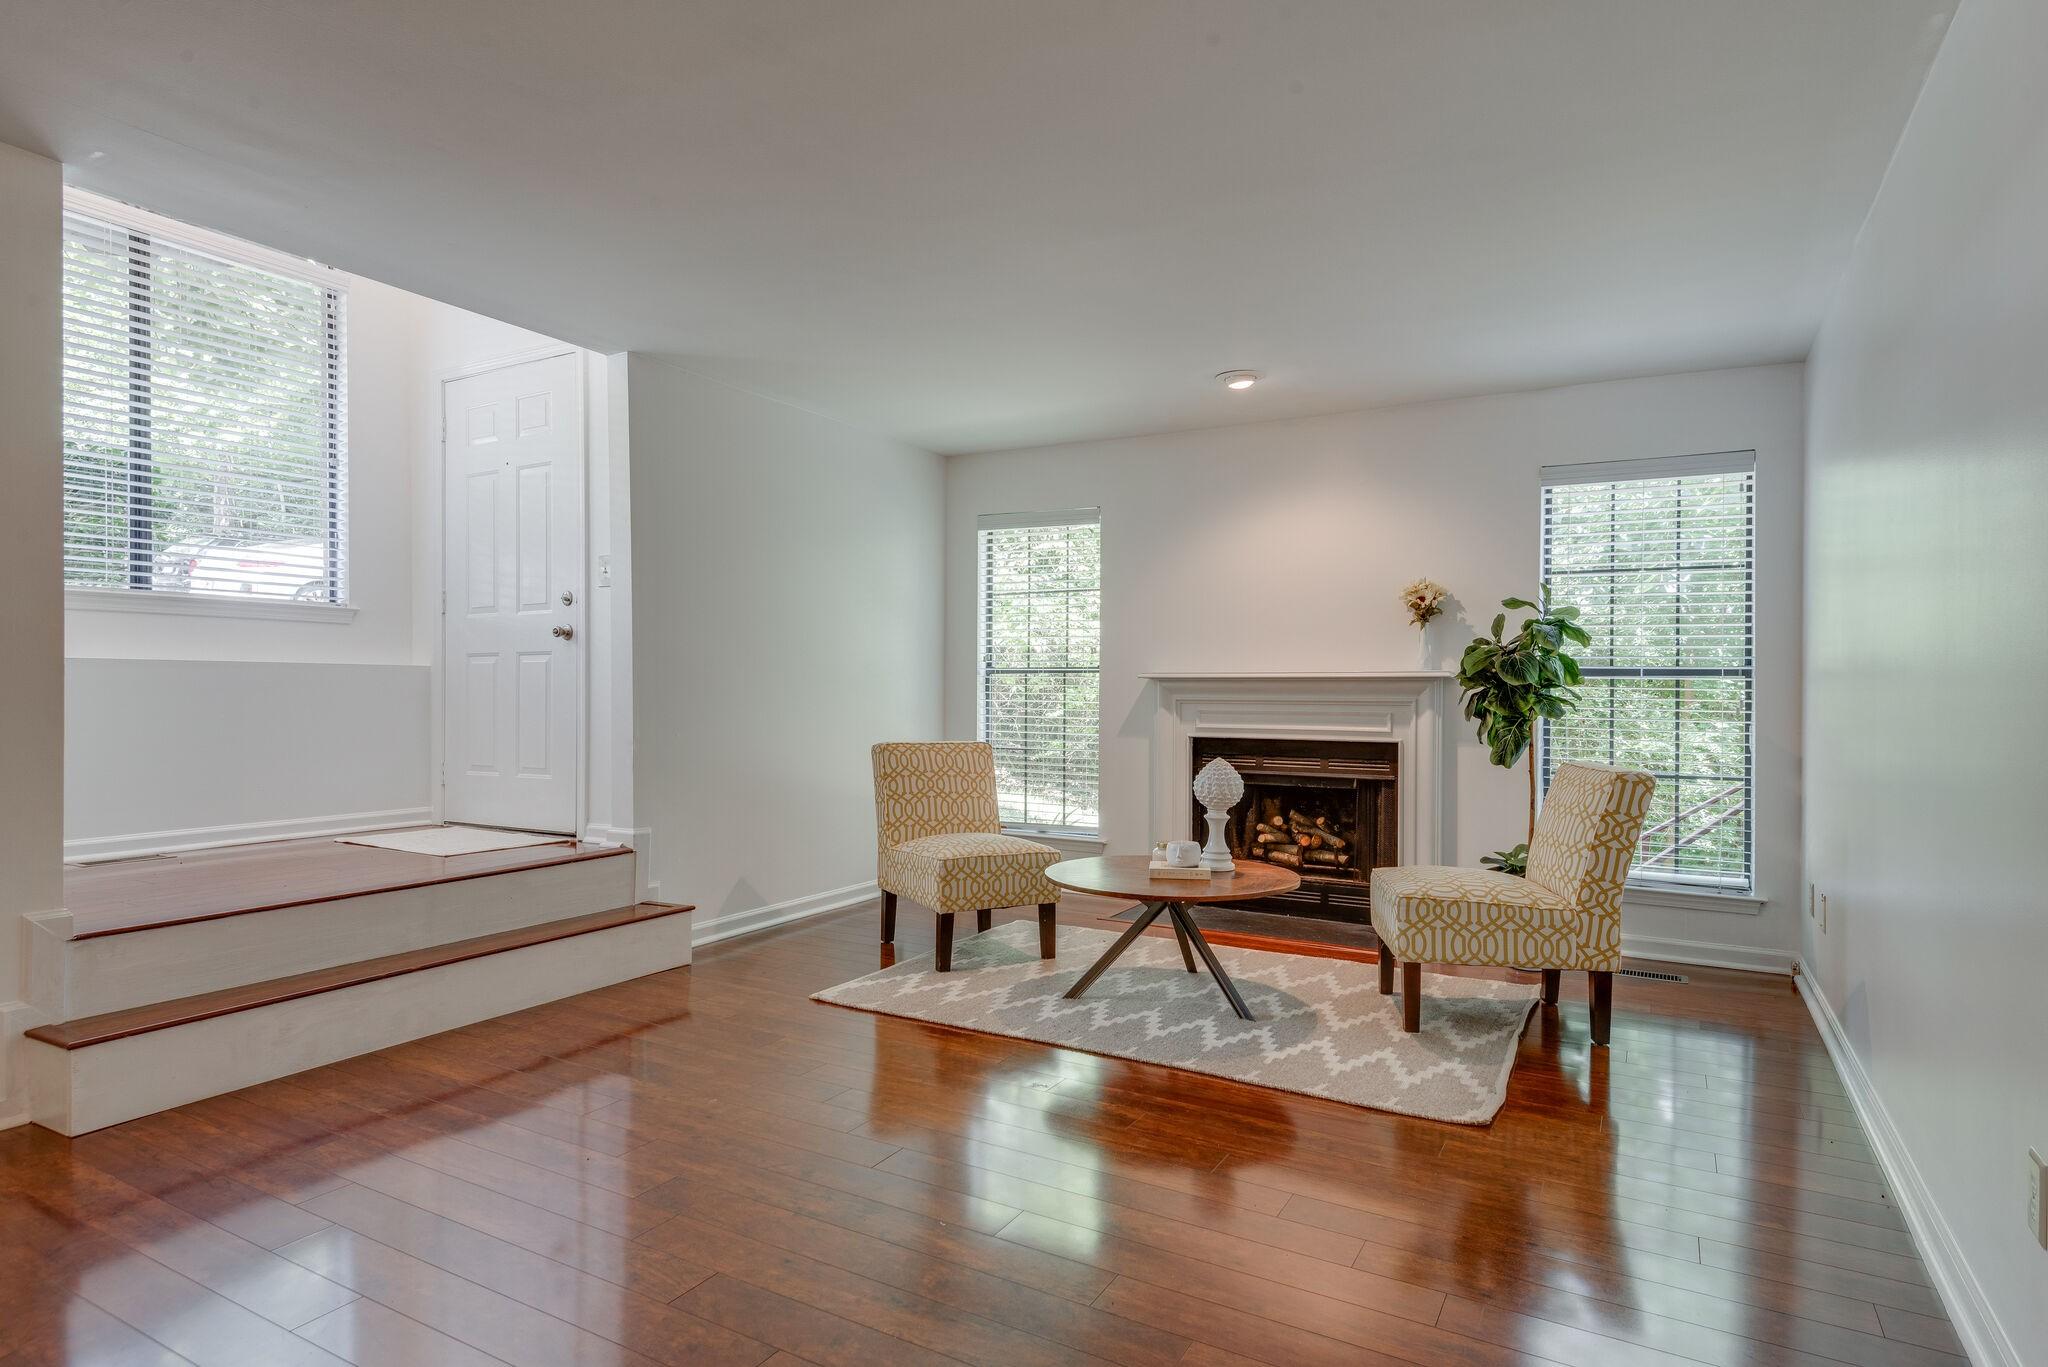 276 Glenstone Cir Property Photo - Brentwood, TN real estate listing